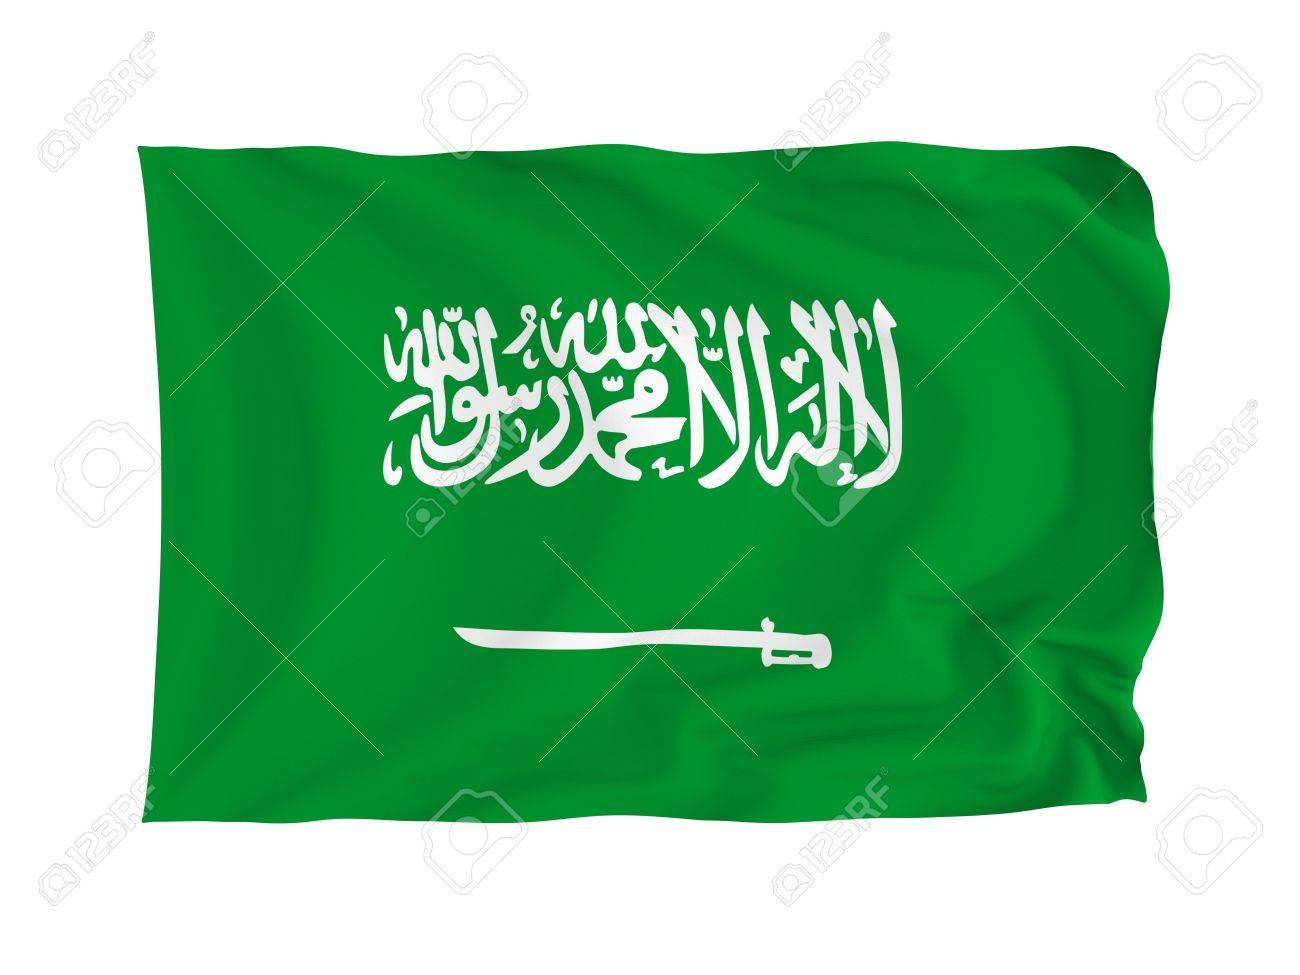 Saudi Arabia. High resolution Flag series. With fabric texture. Stock Photo - 5793671